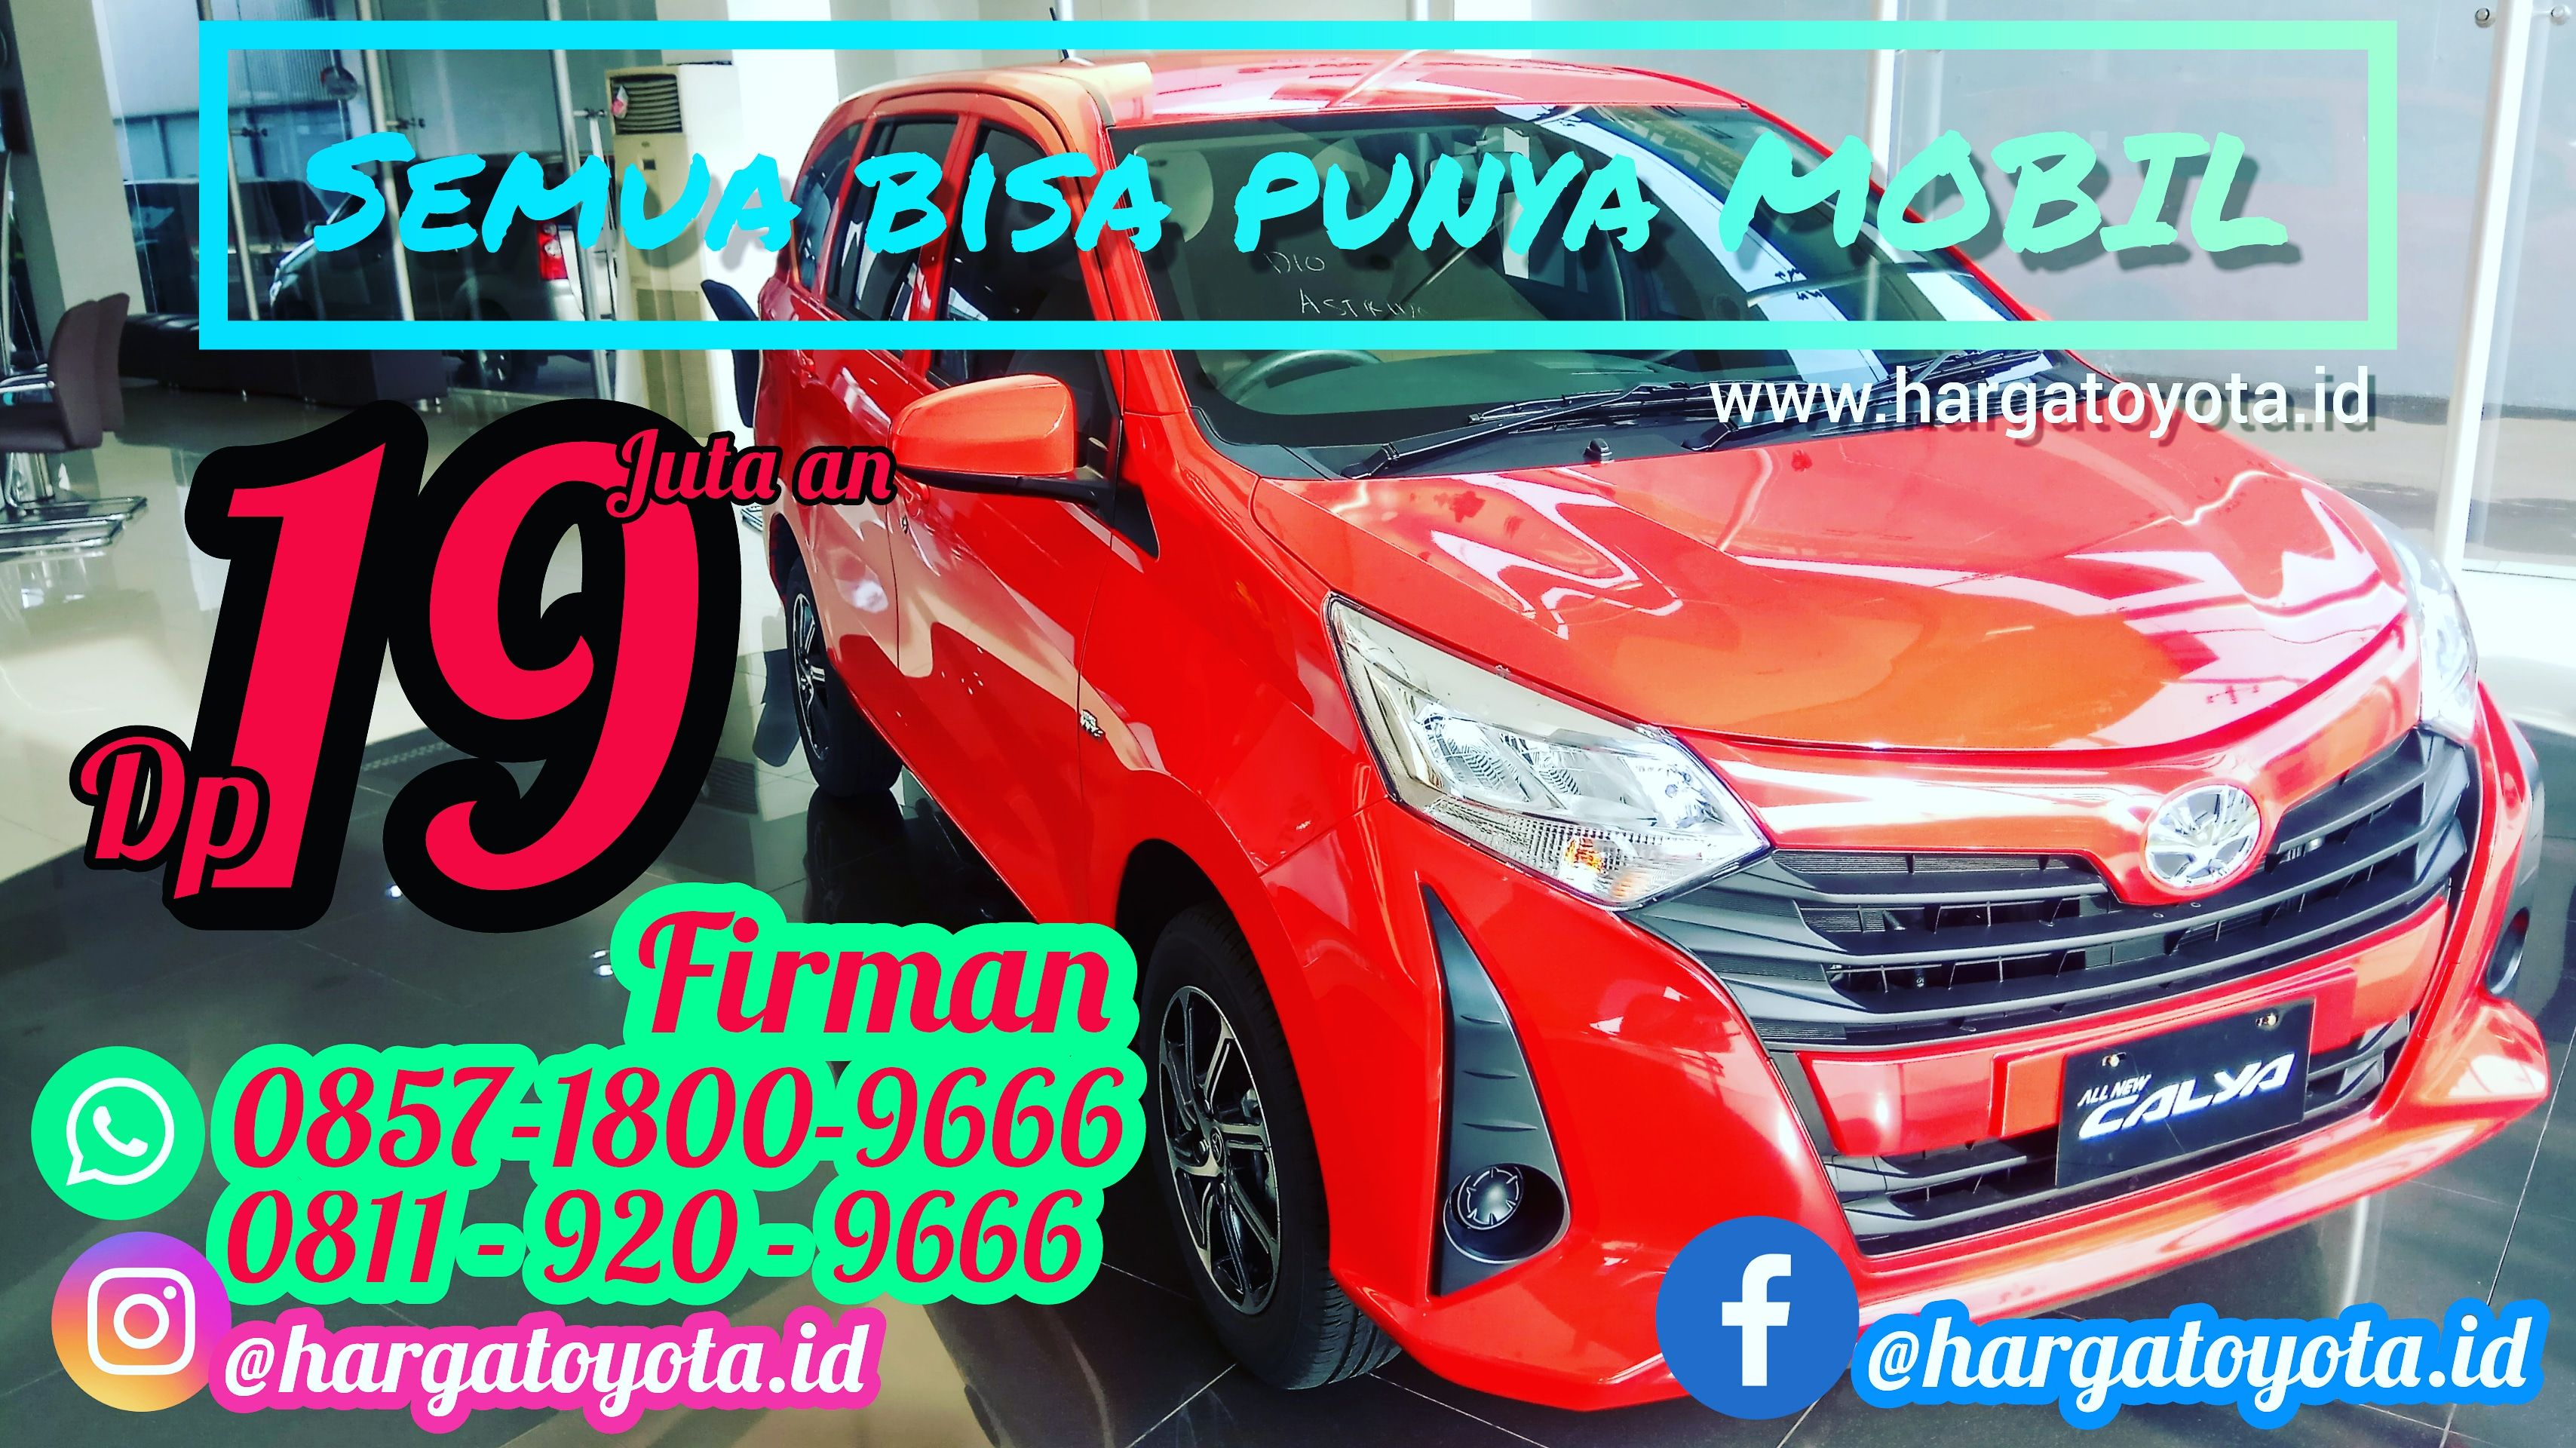 Toyota Jakarta Barat Promo Calya Dp 20% - Mobils.id di ...